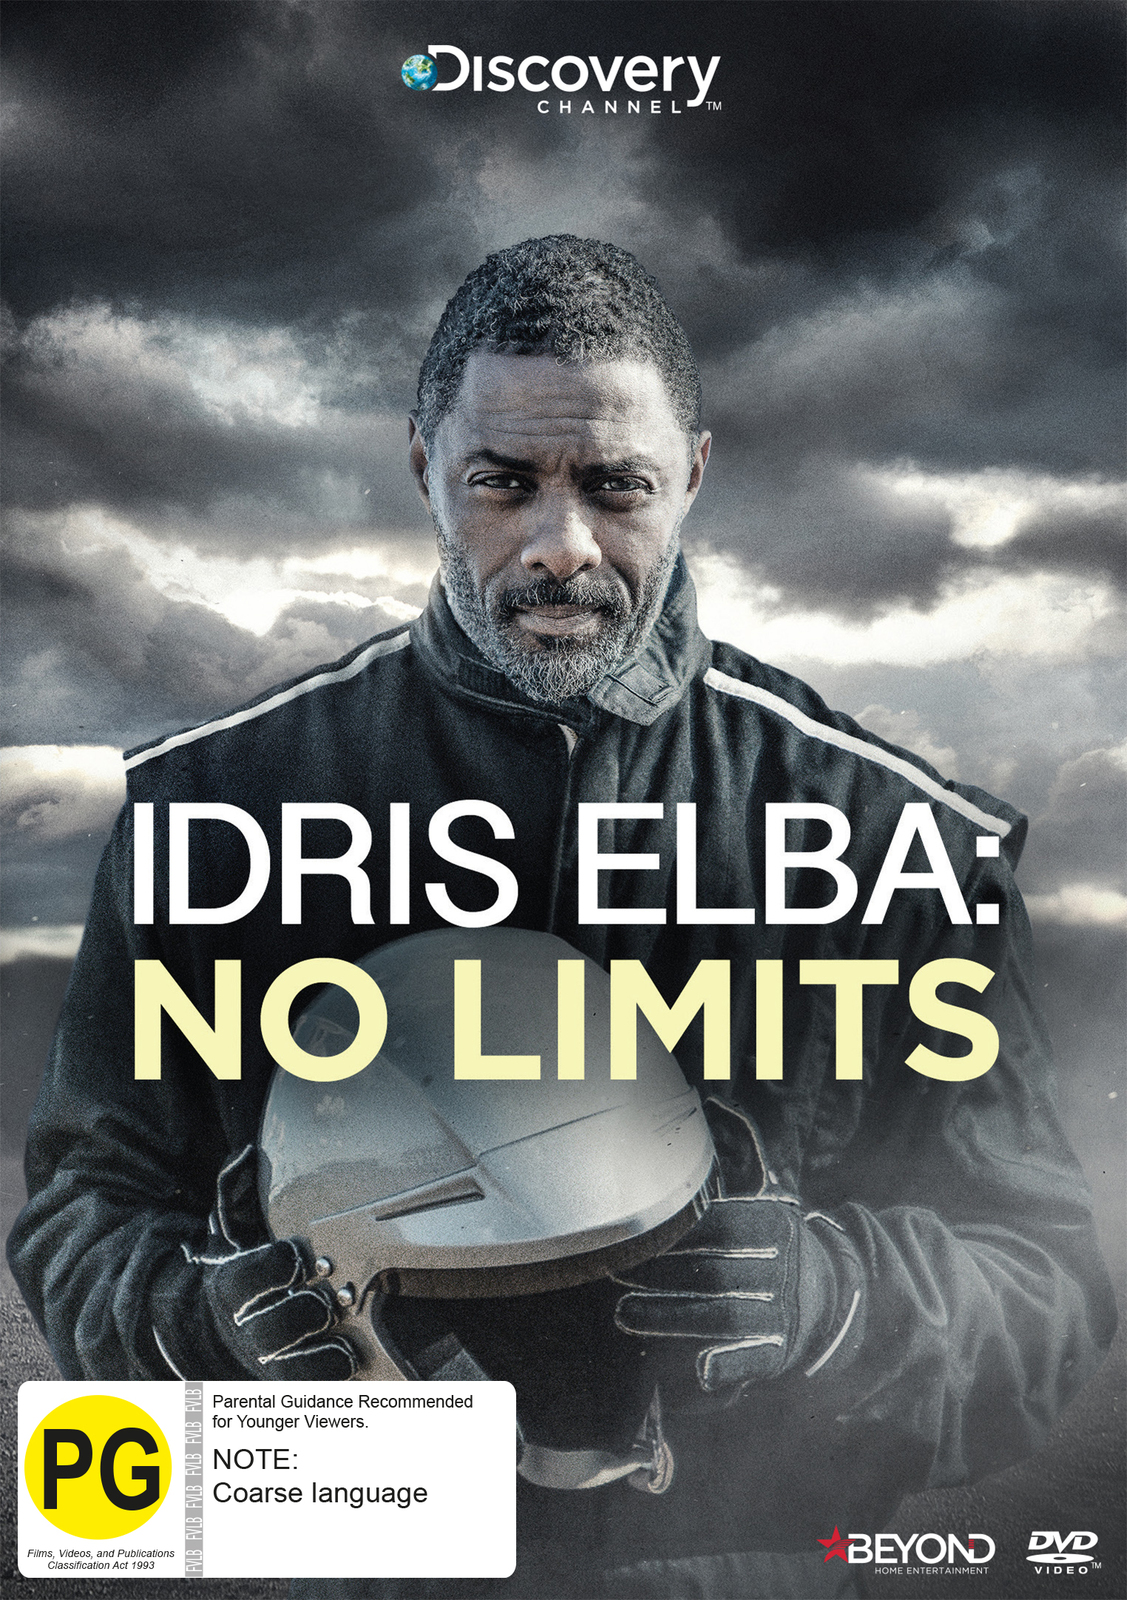 Idris Elba: No Limits image